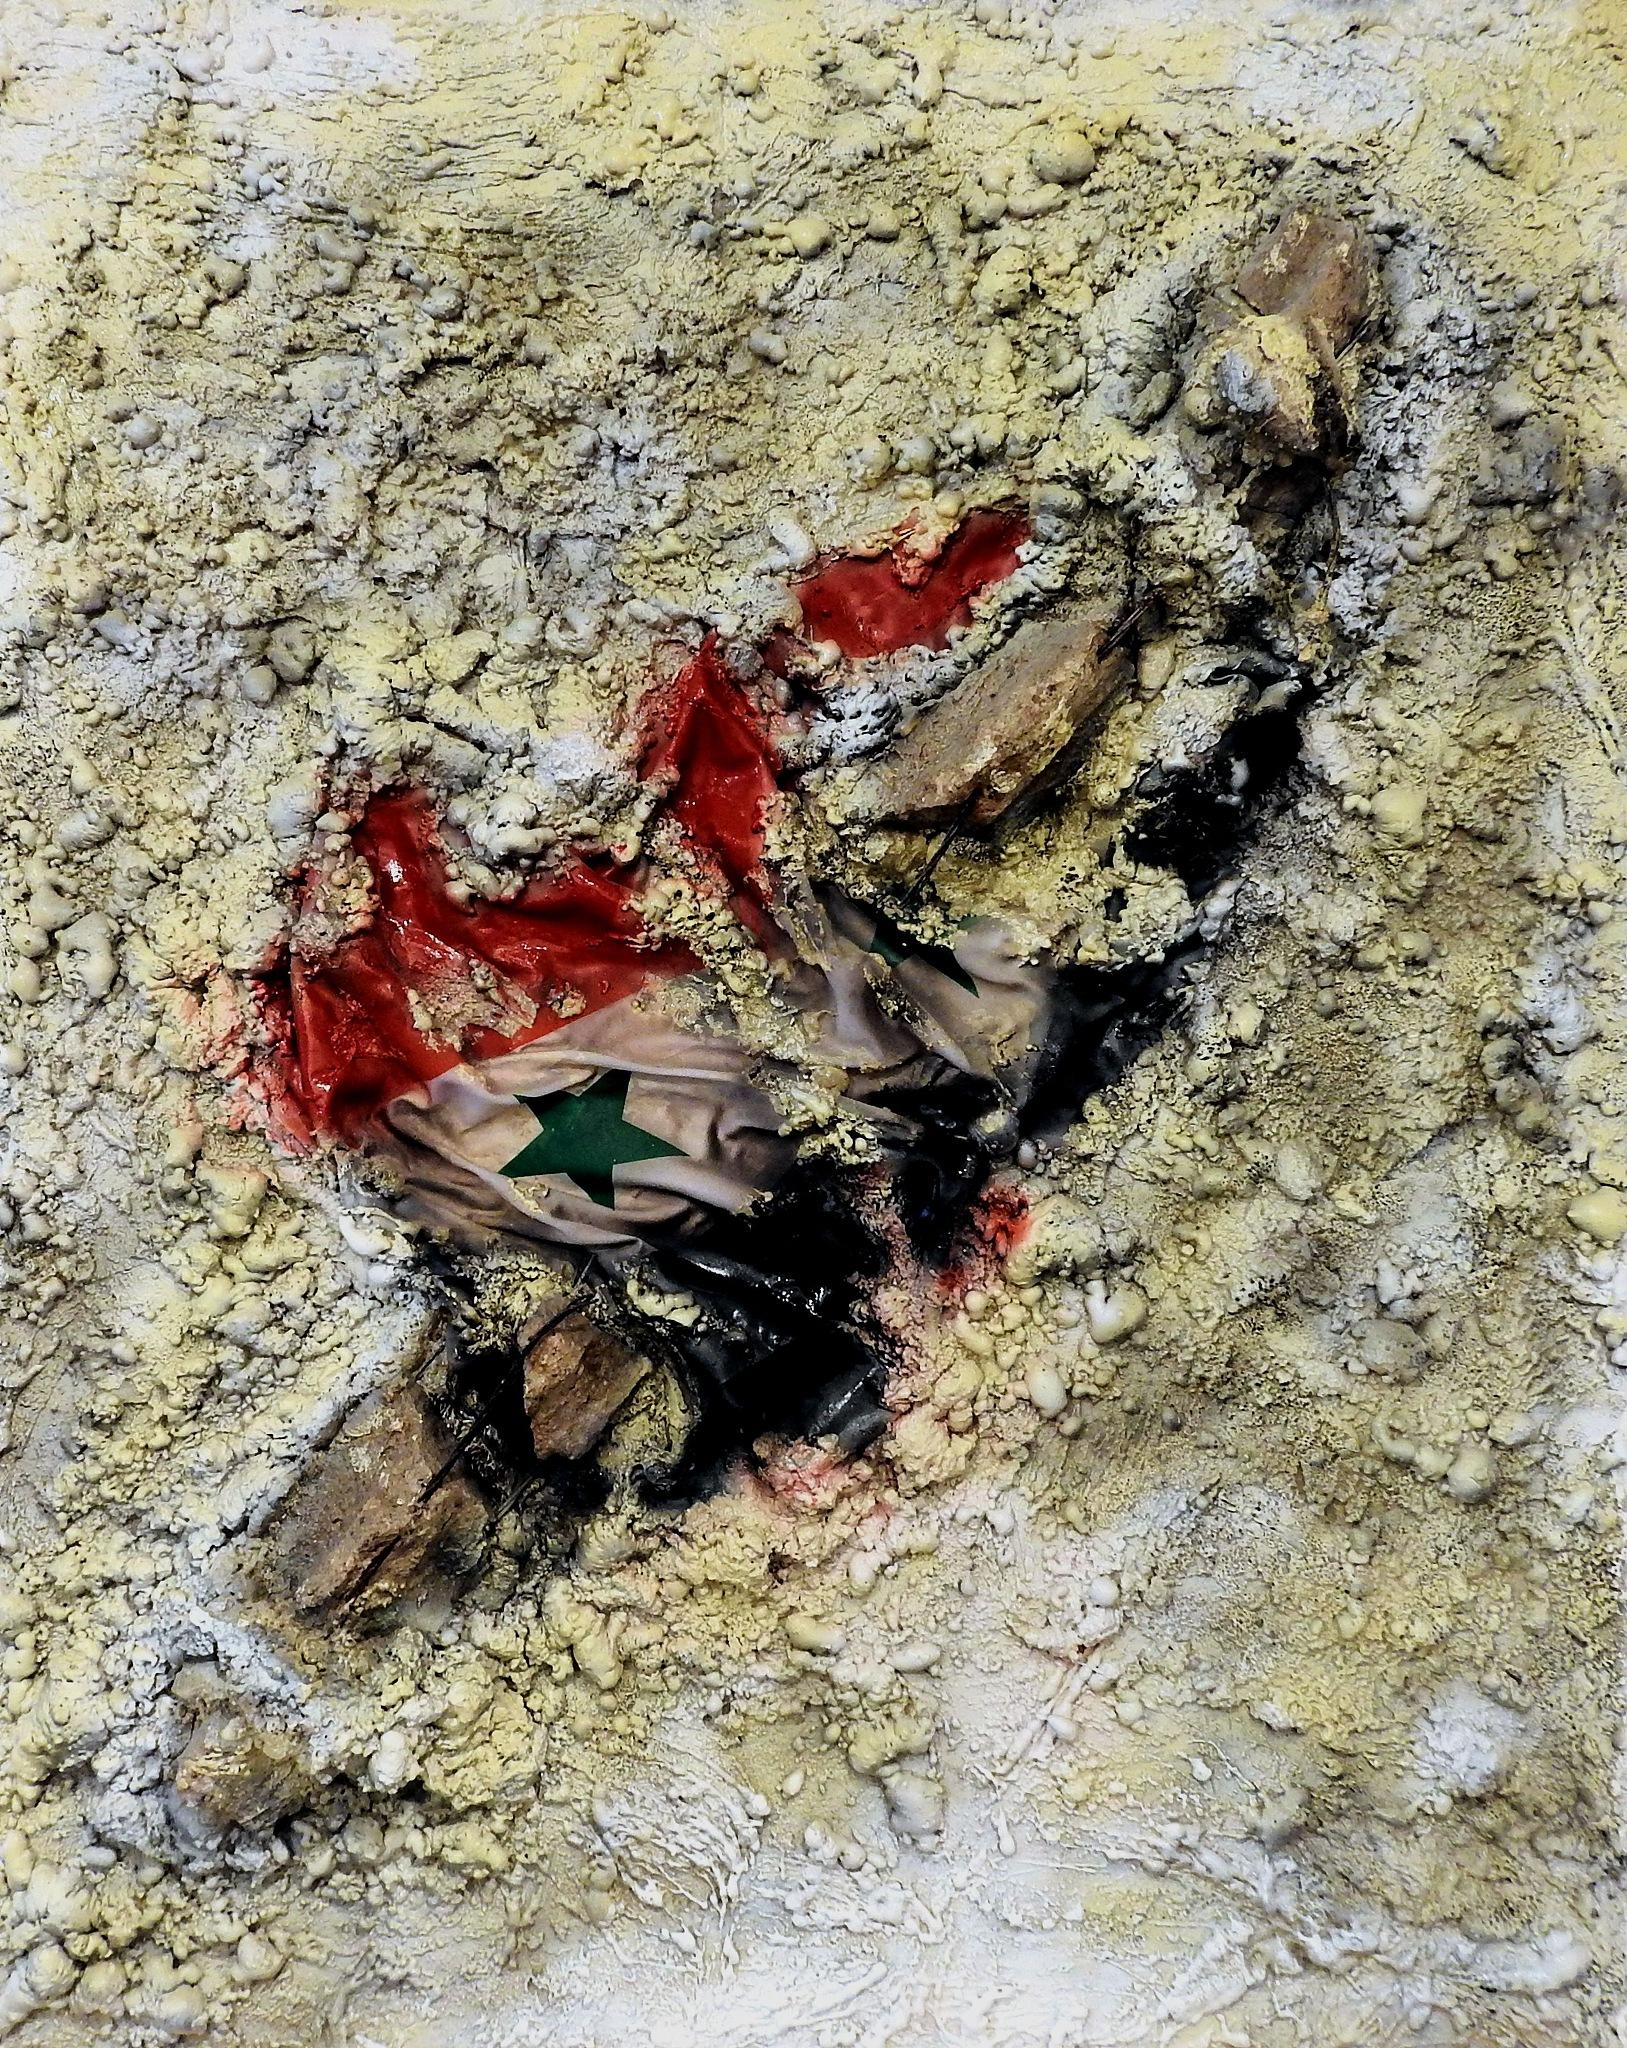 P.A.N. Napoli - Broken Flag - Maurizio Romeo - Papé Satan Aleppo - 2 by Arnaldo De Lisio